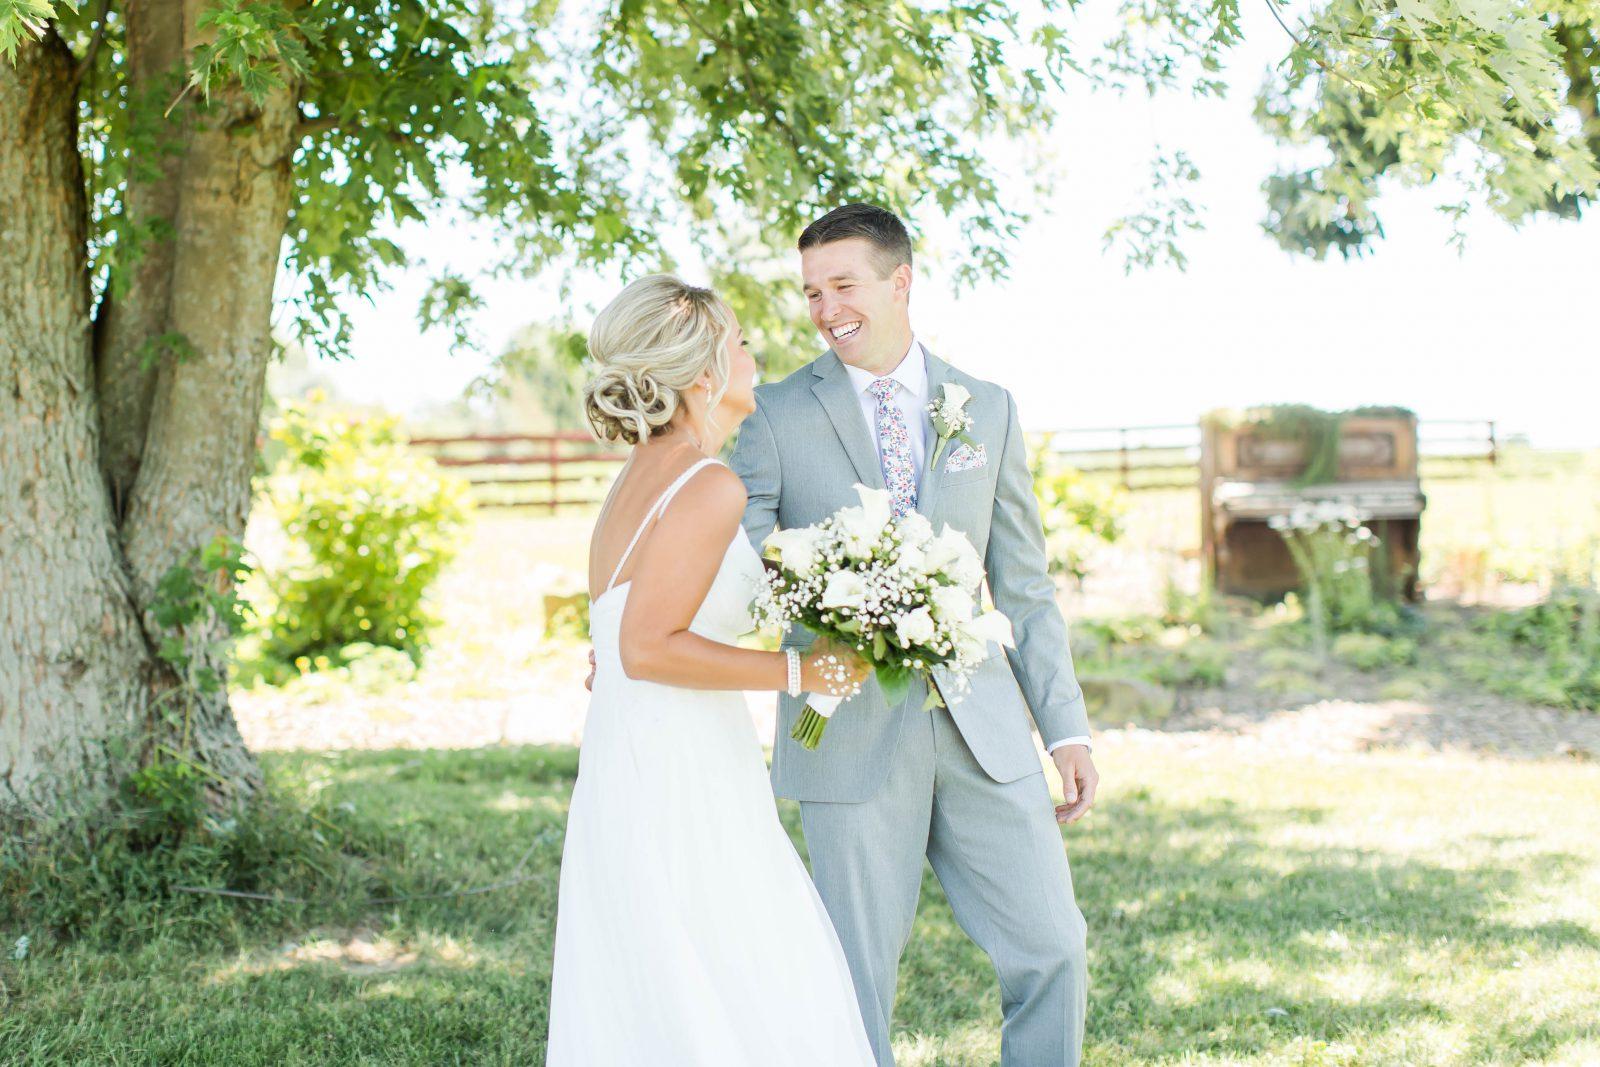 peacock-ridge-summer-wedding-photographer-akron-ohio-loren-jackson-photography-25